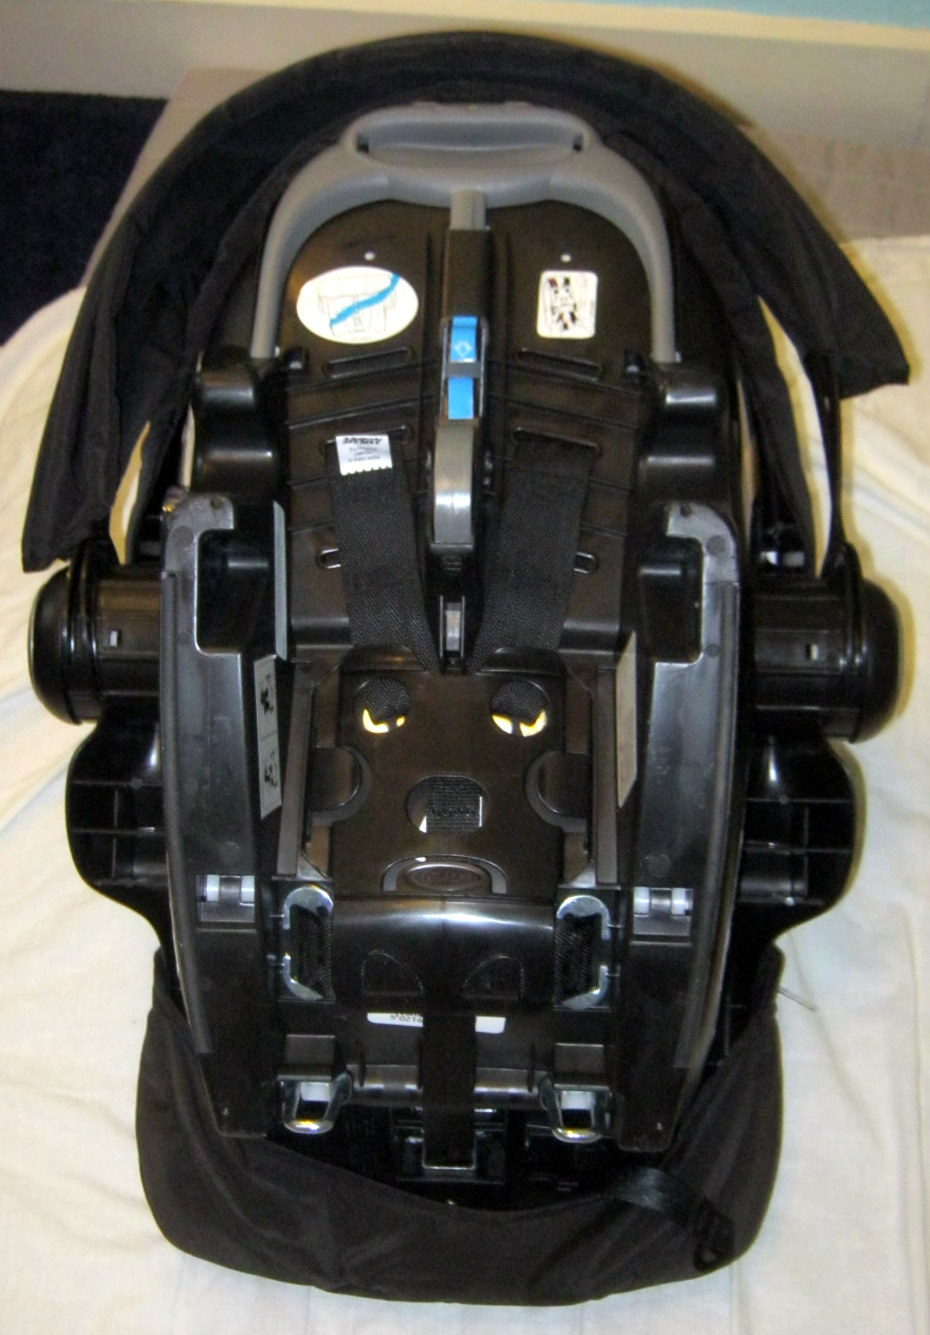 Graco car seat - bottom